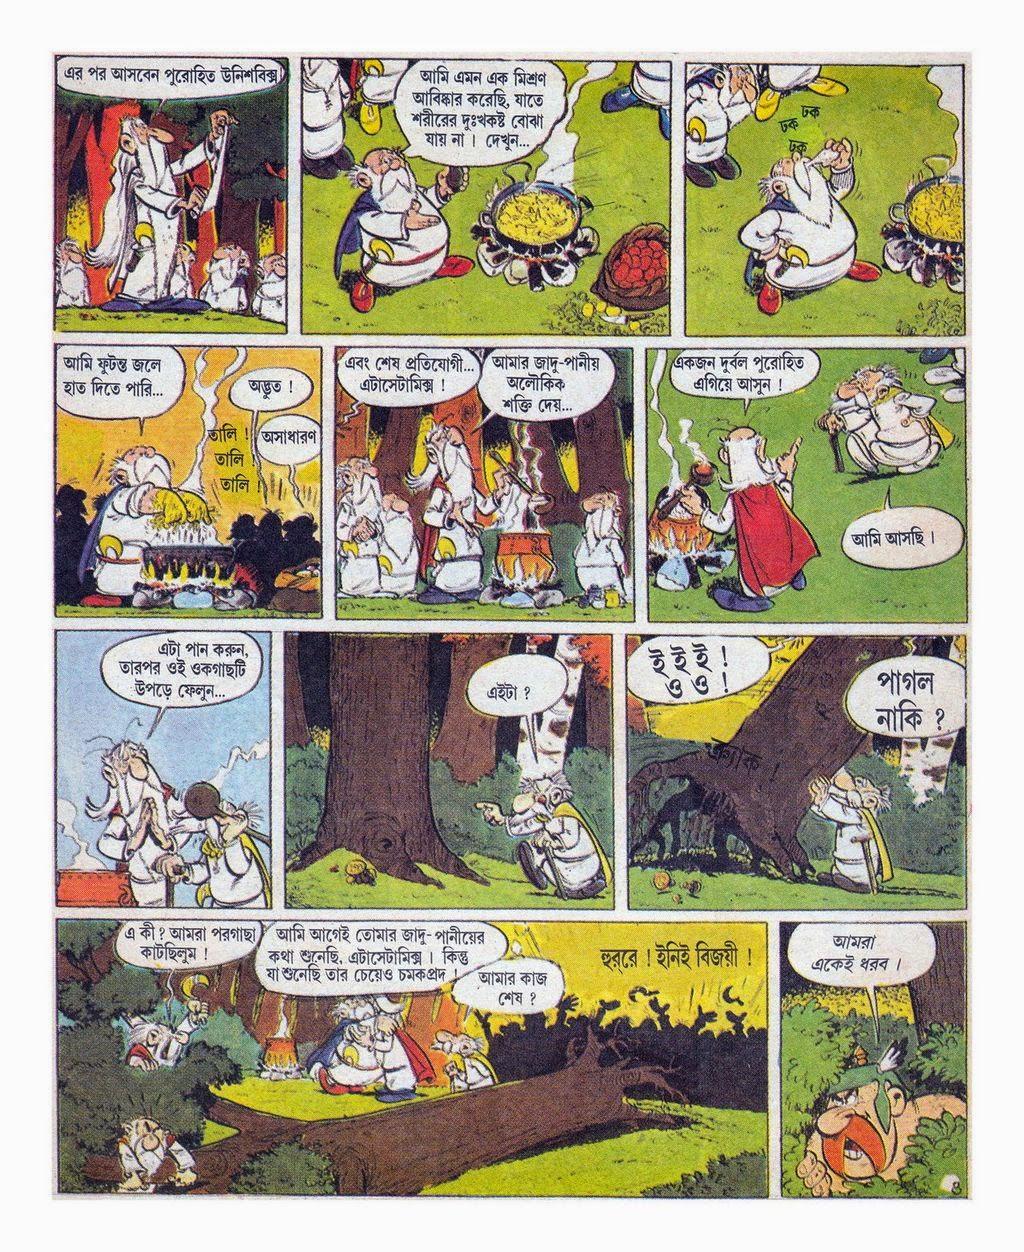 RAPPA ROY COMICS PDF DOWNLOAD